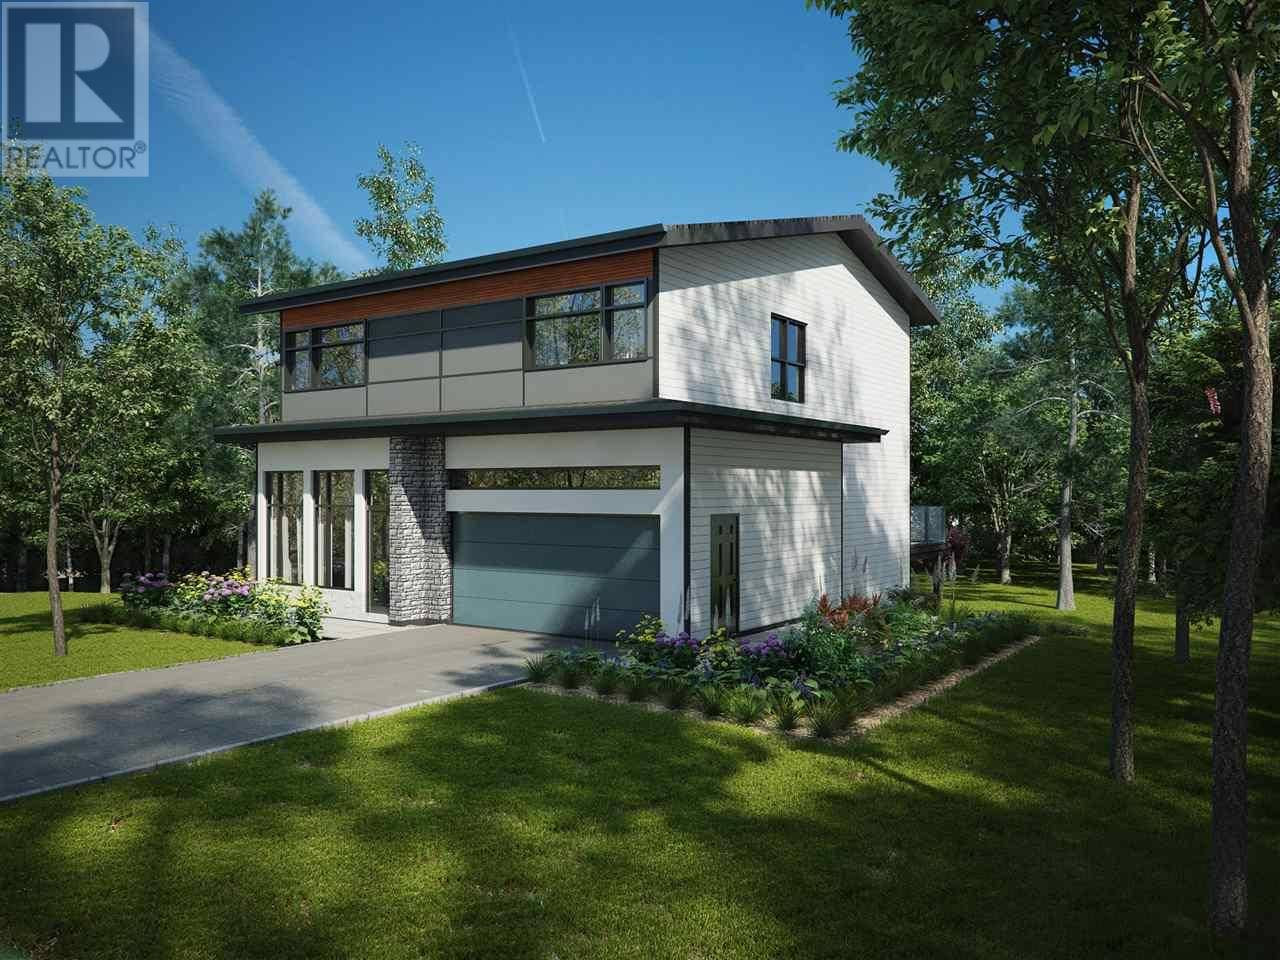 House for sale at 171 Cutter Dr Unit Lot Cd08 Halifax Nova Scotia - MLS: 201926174